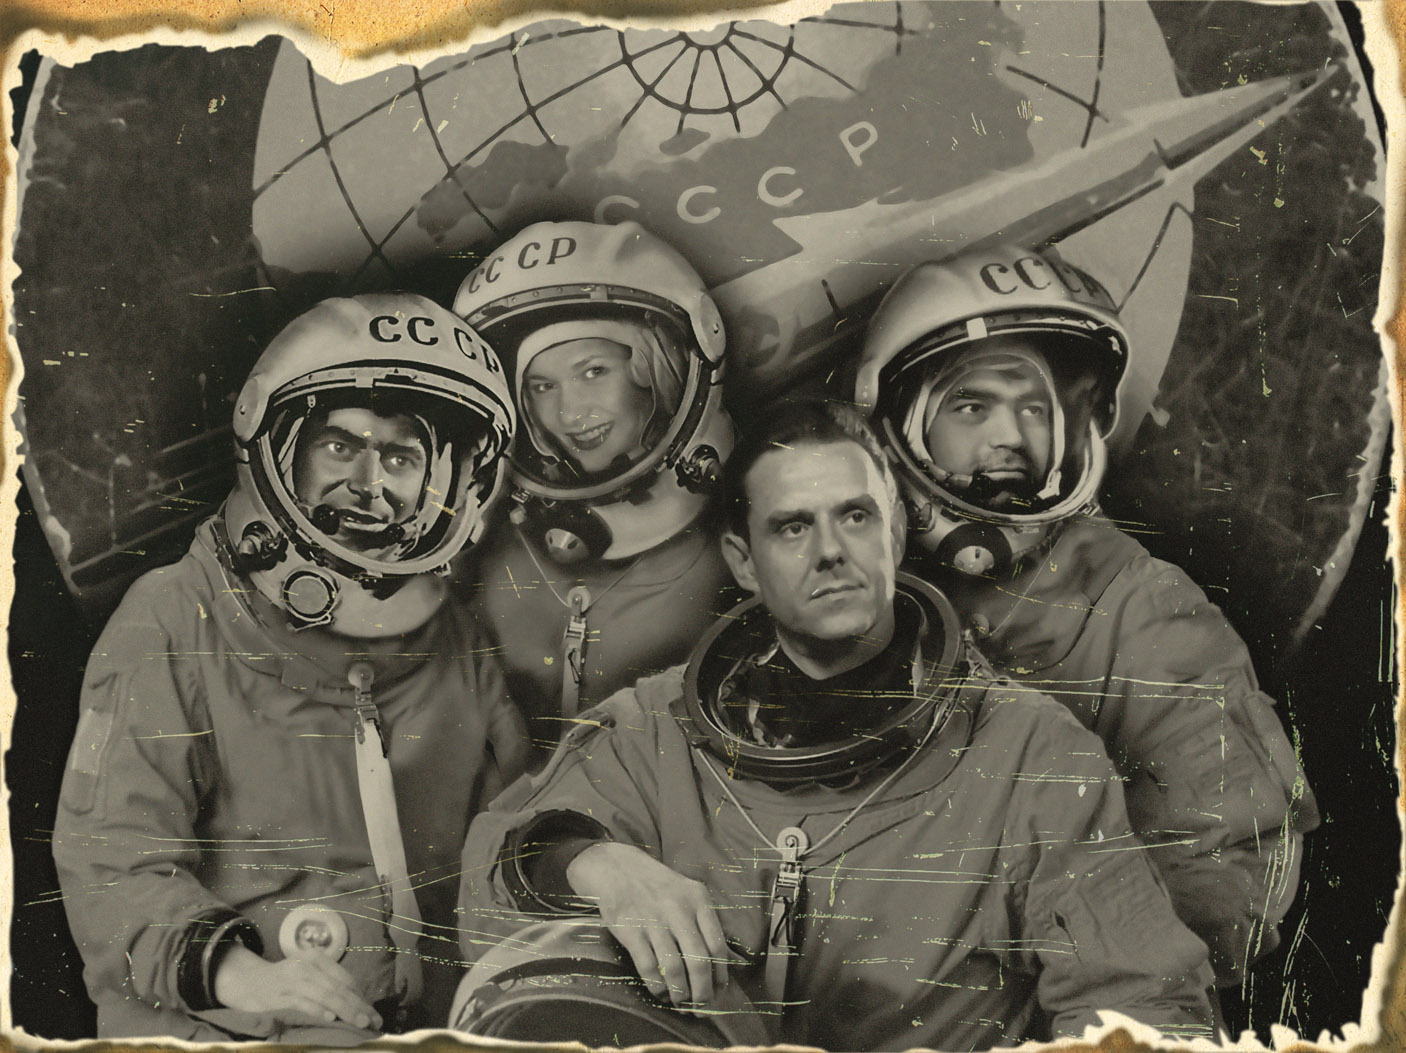 cosmo crew 01 small.jpg